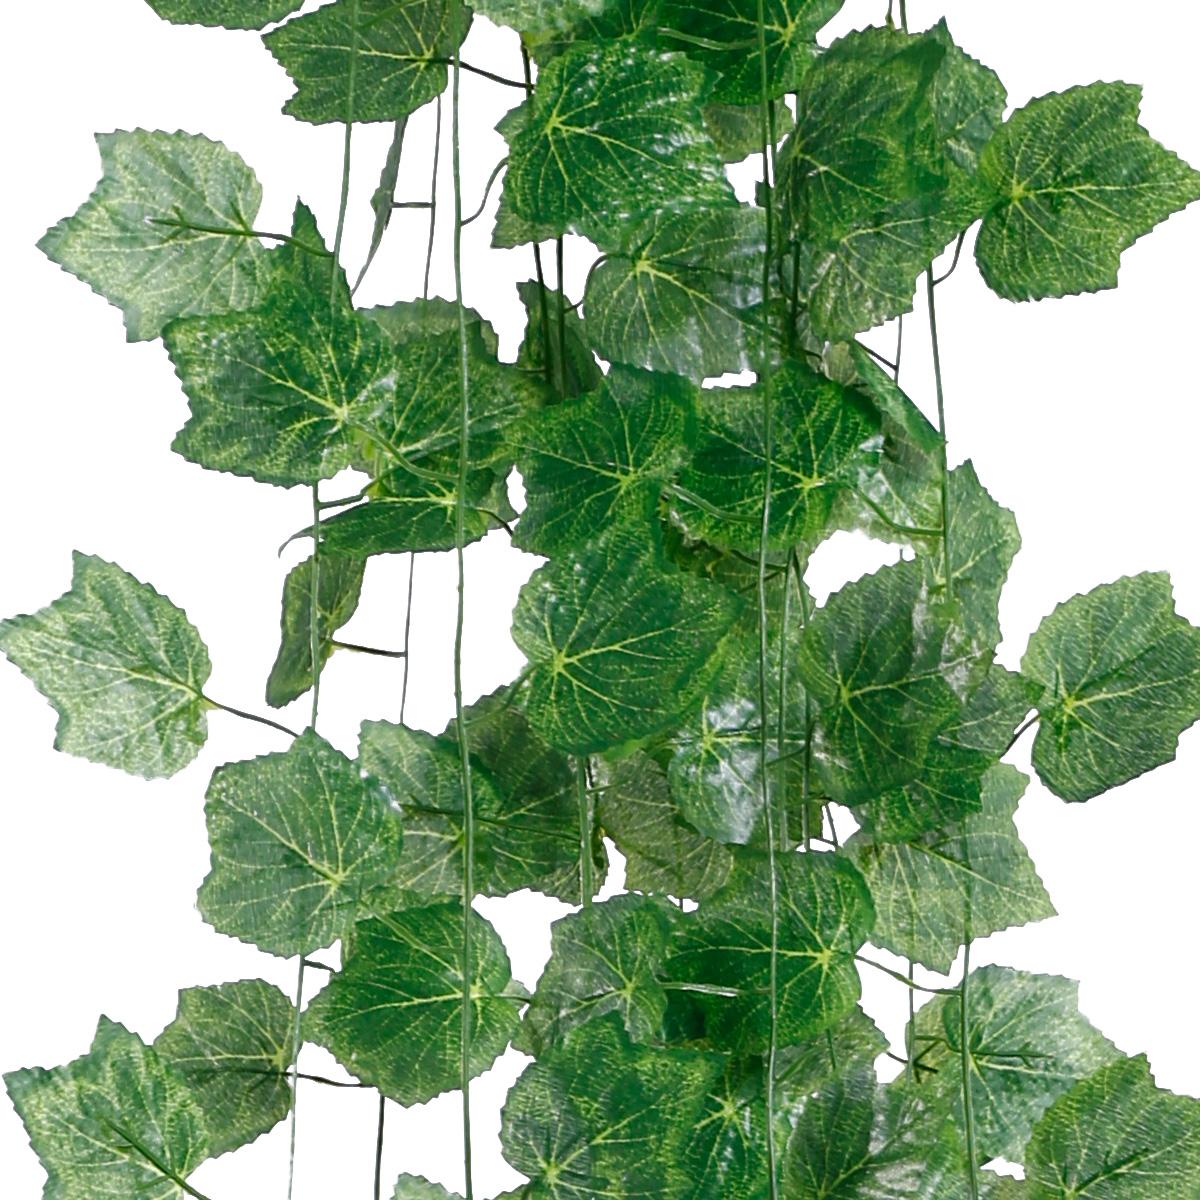 12 x k nstliche efeu girlande garten deko h ngend pflanzen kunstpflanze 2 2m ebay. Black Bedroom Furniture Sets. Home Design Ideas